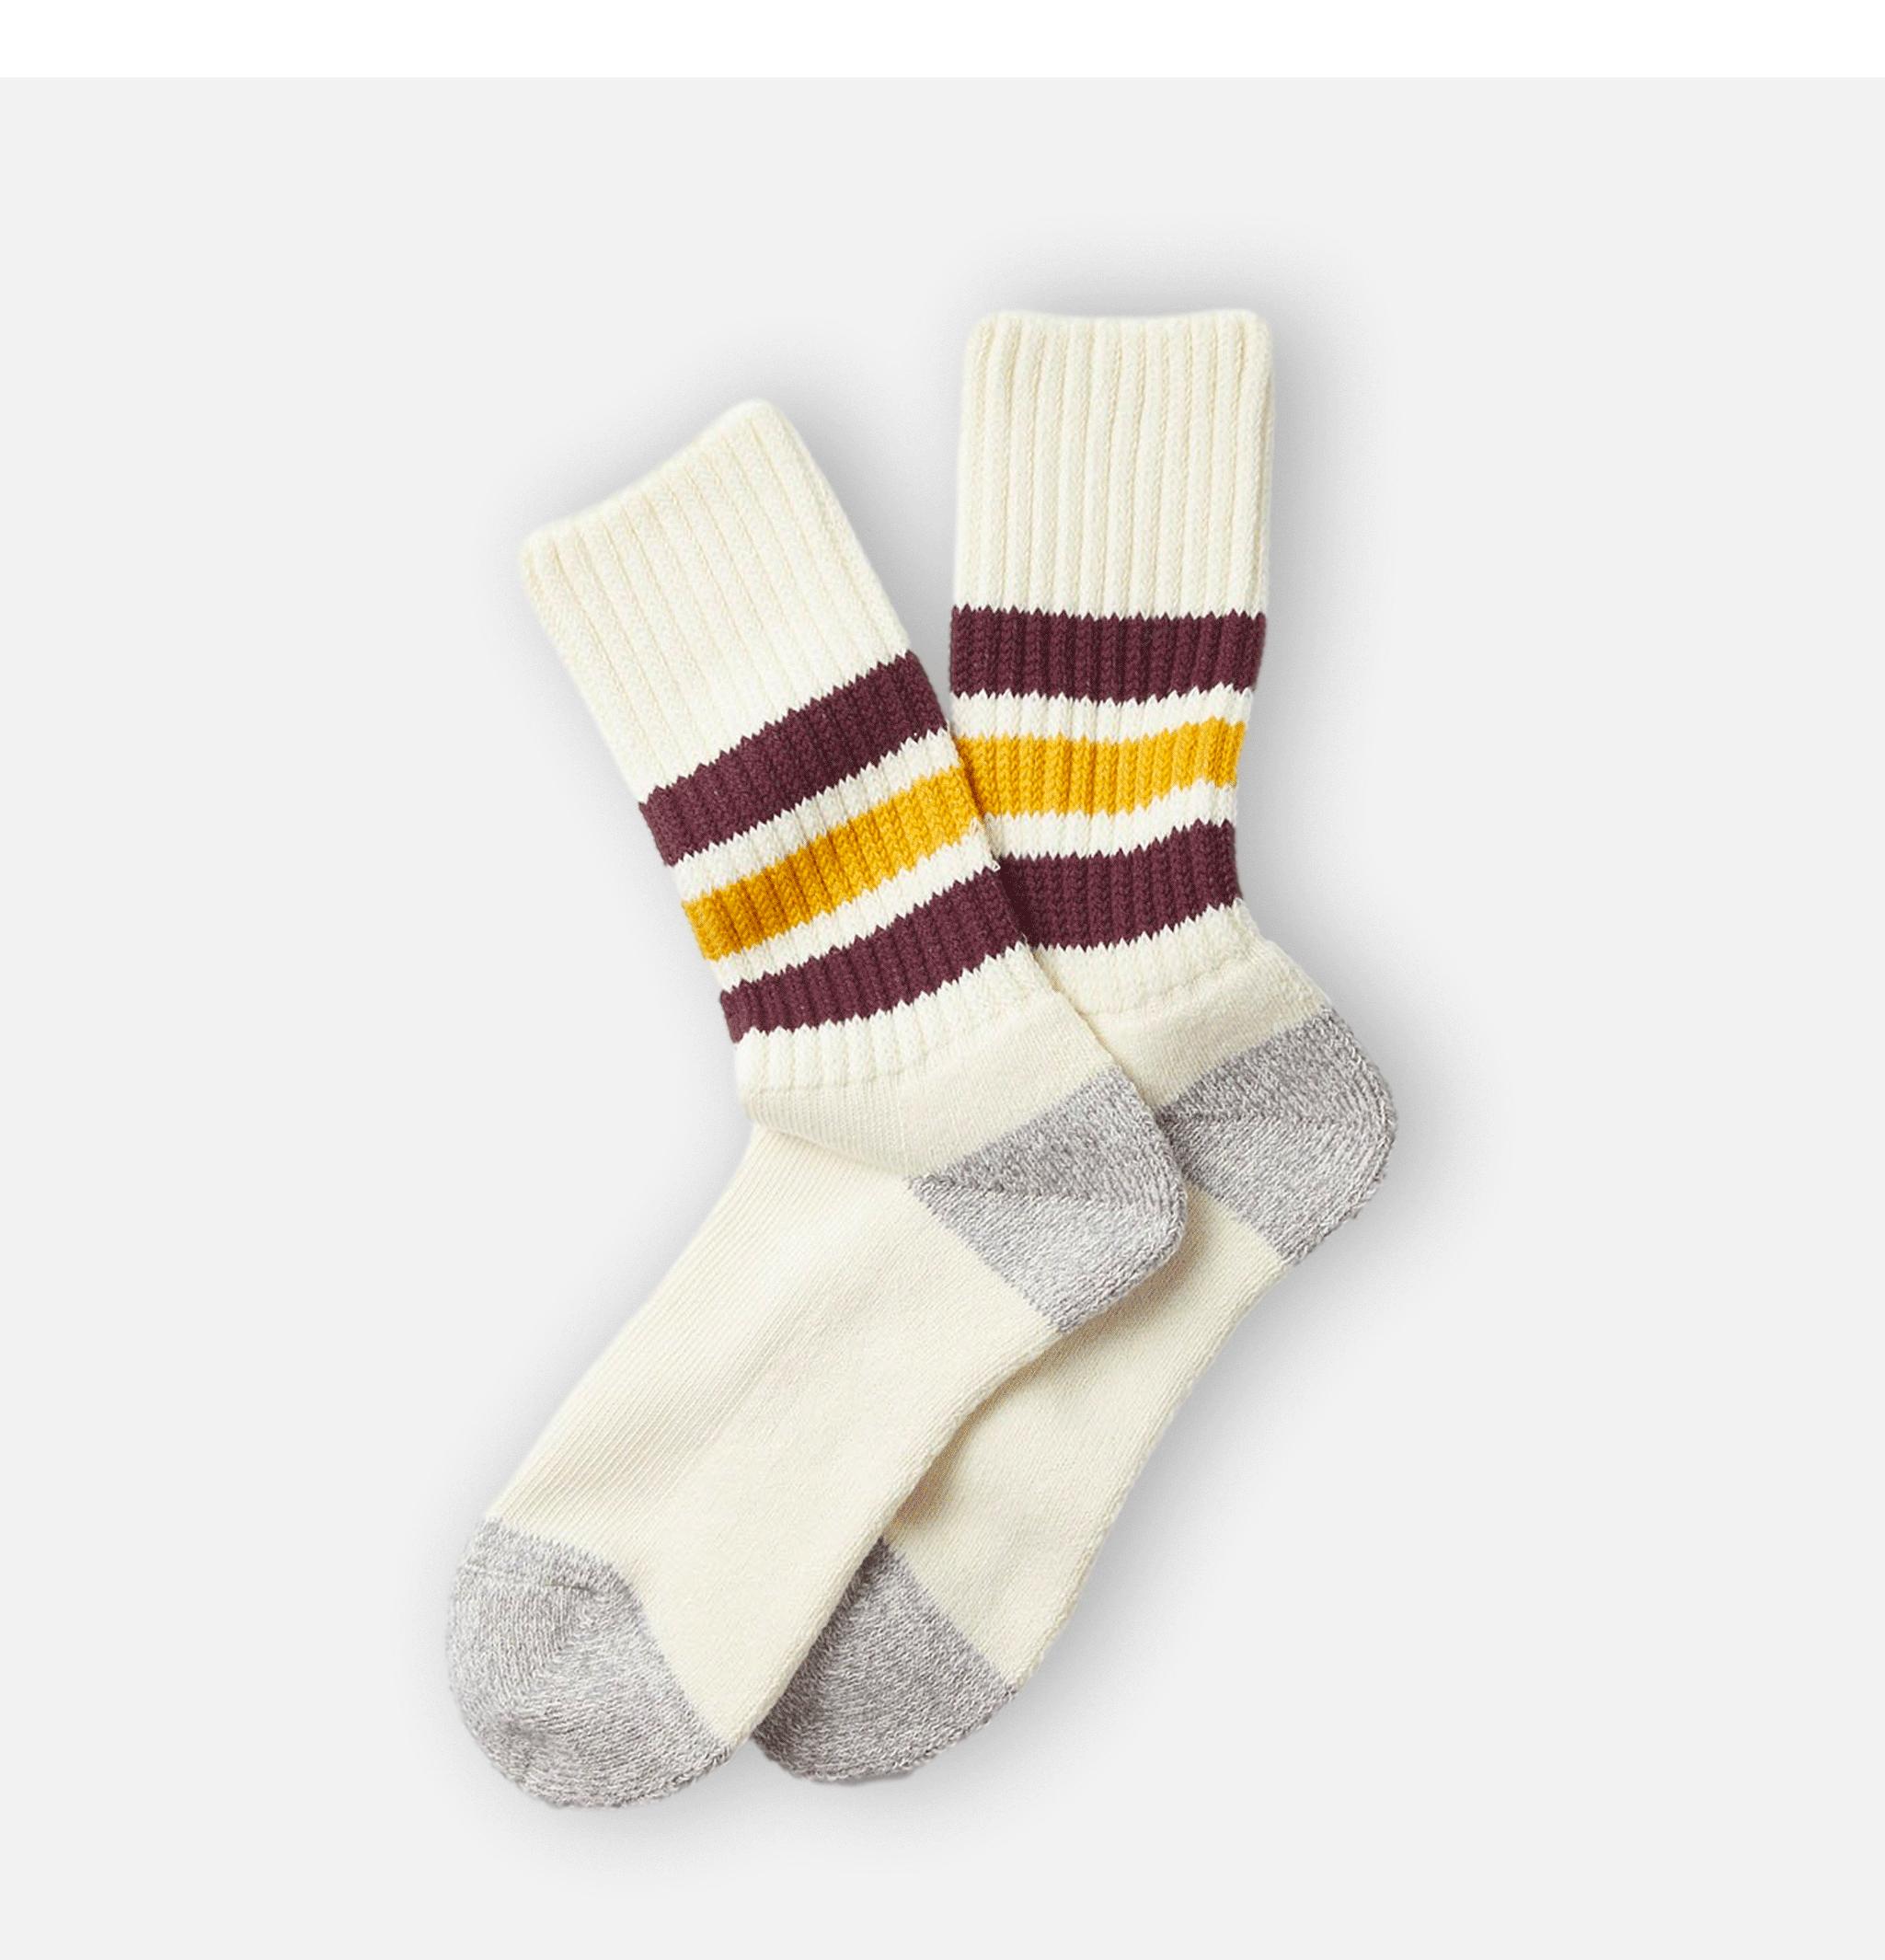 Coarse Socks Bordeaux